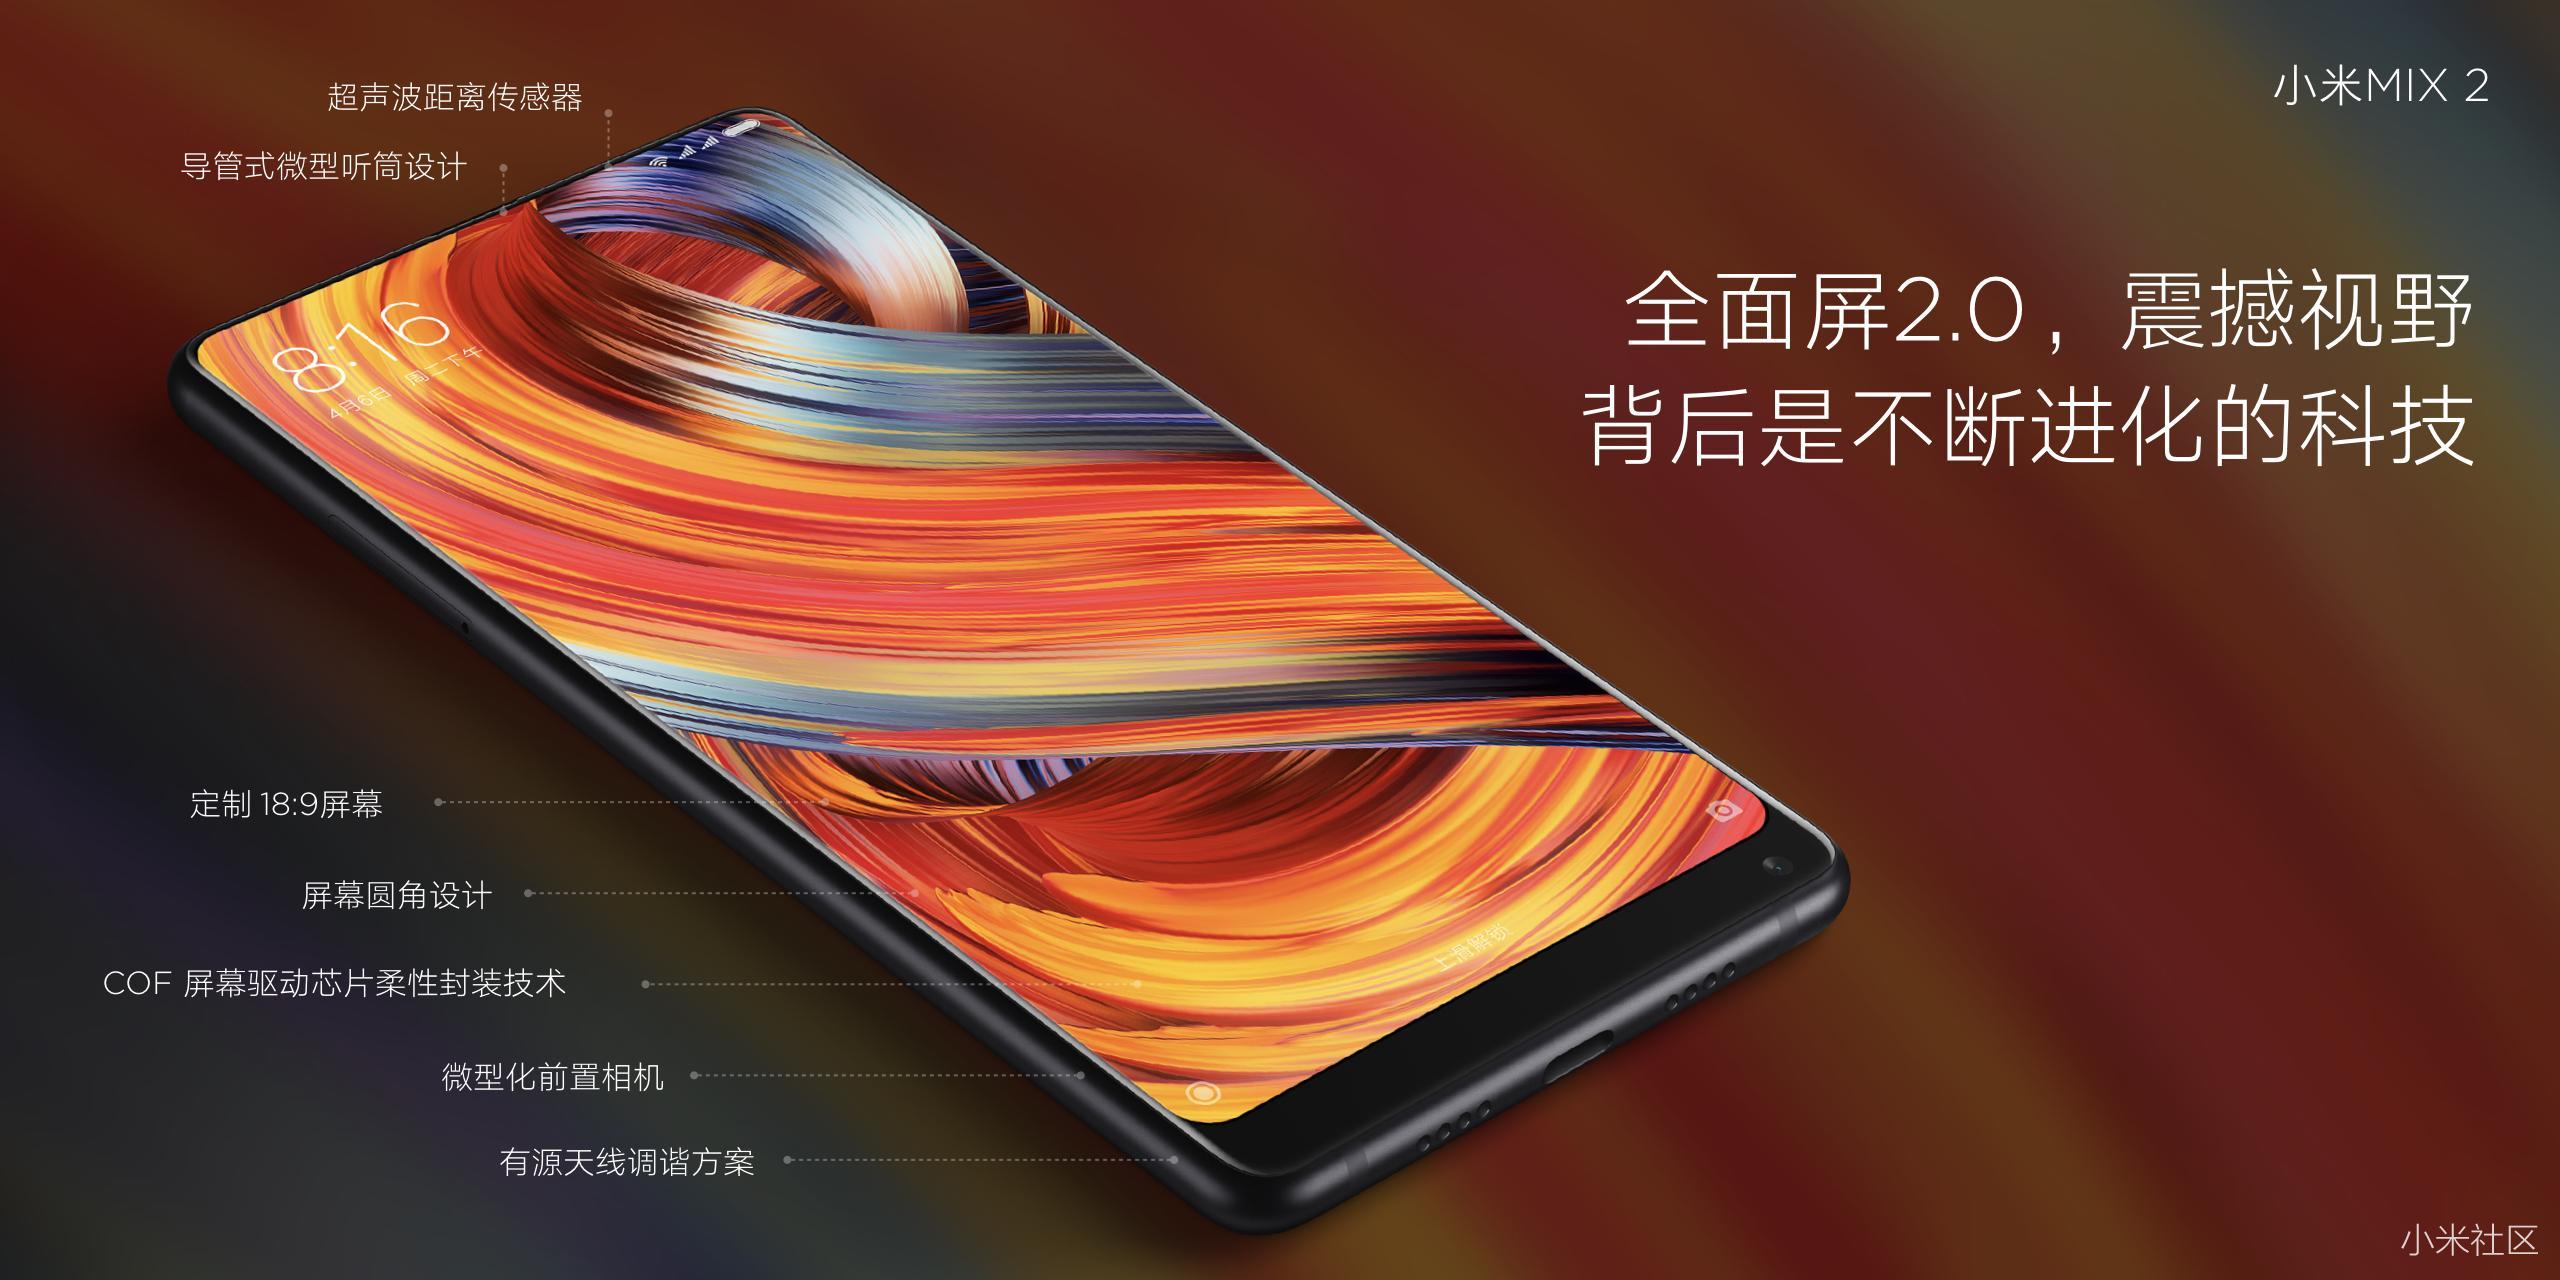 Xiaomi Mi MIX 2 características